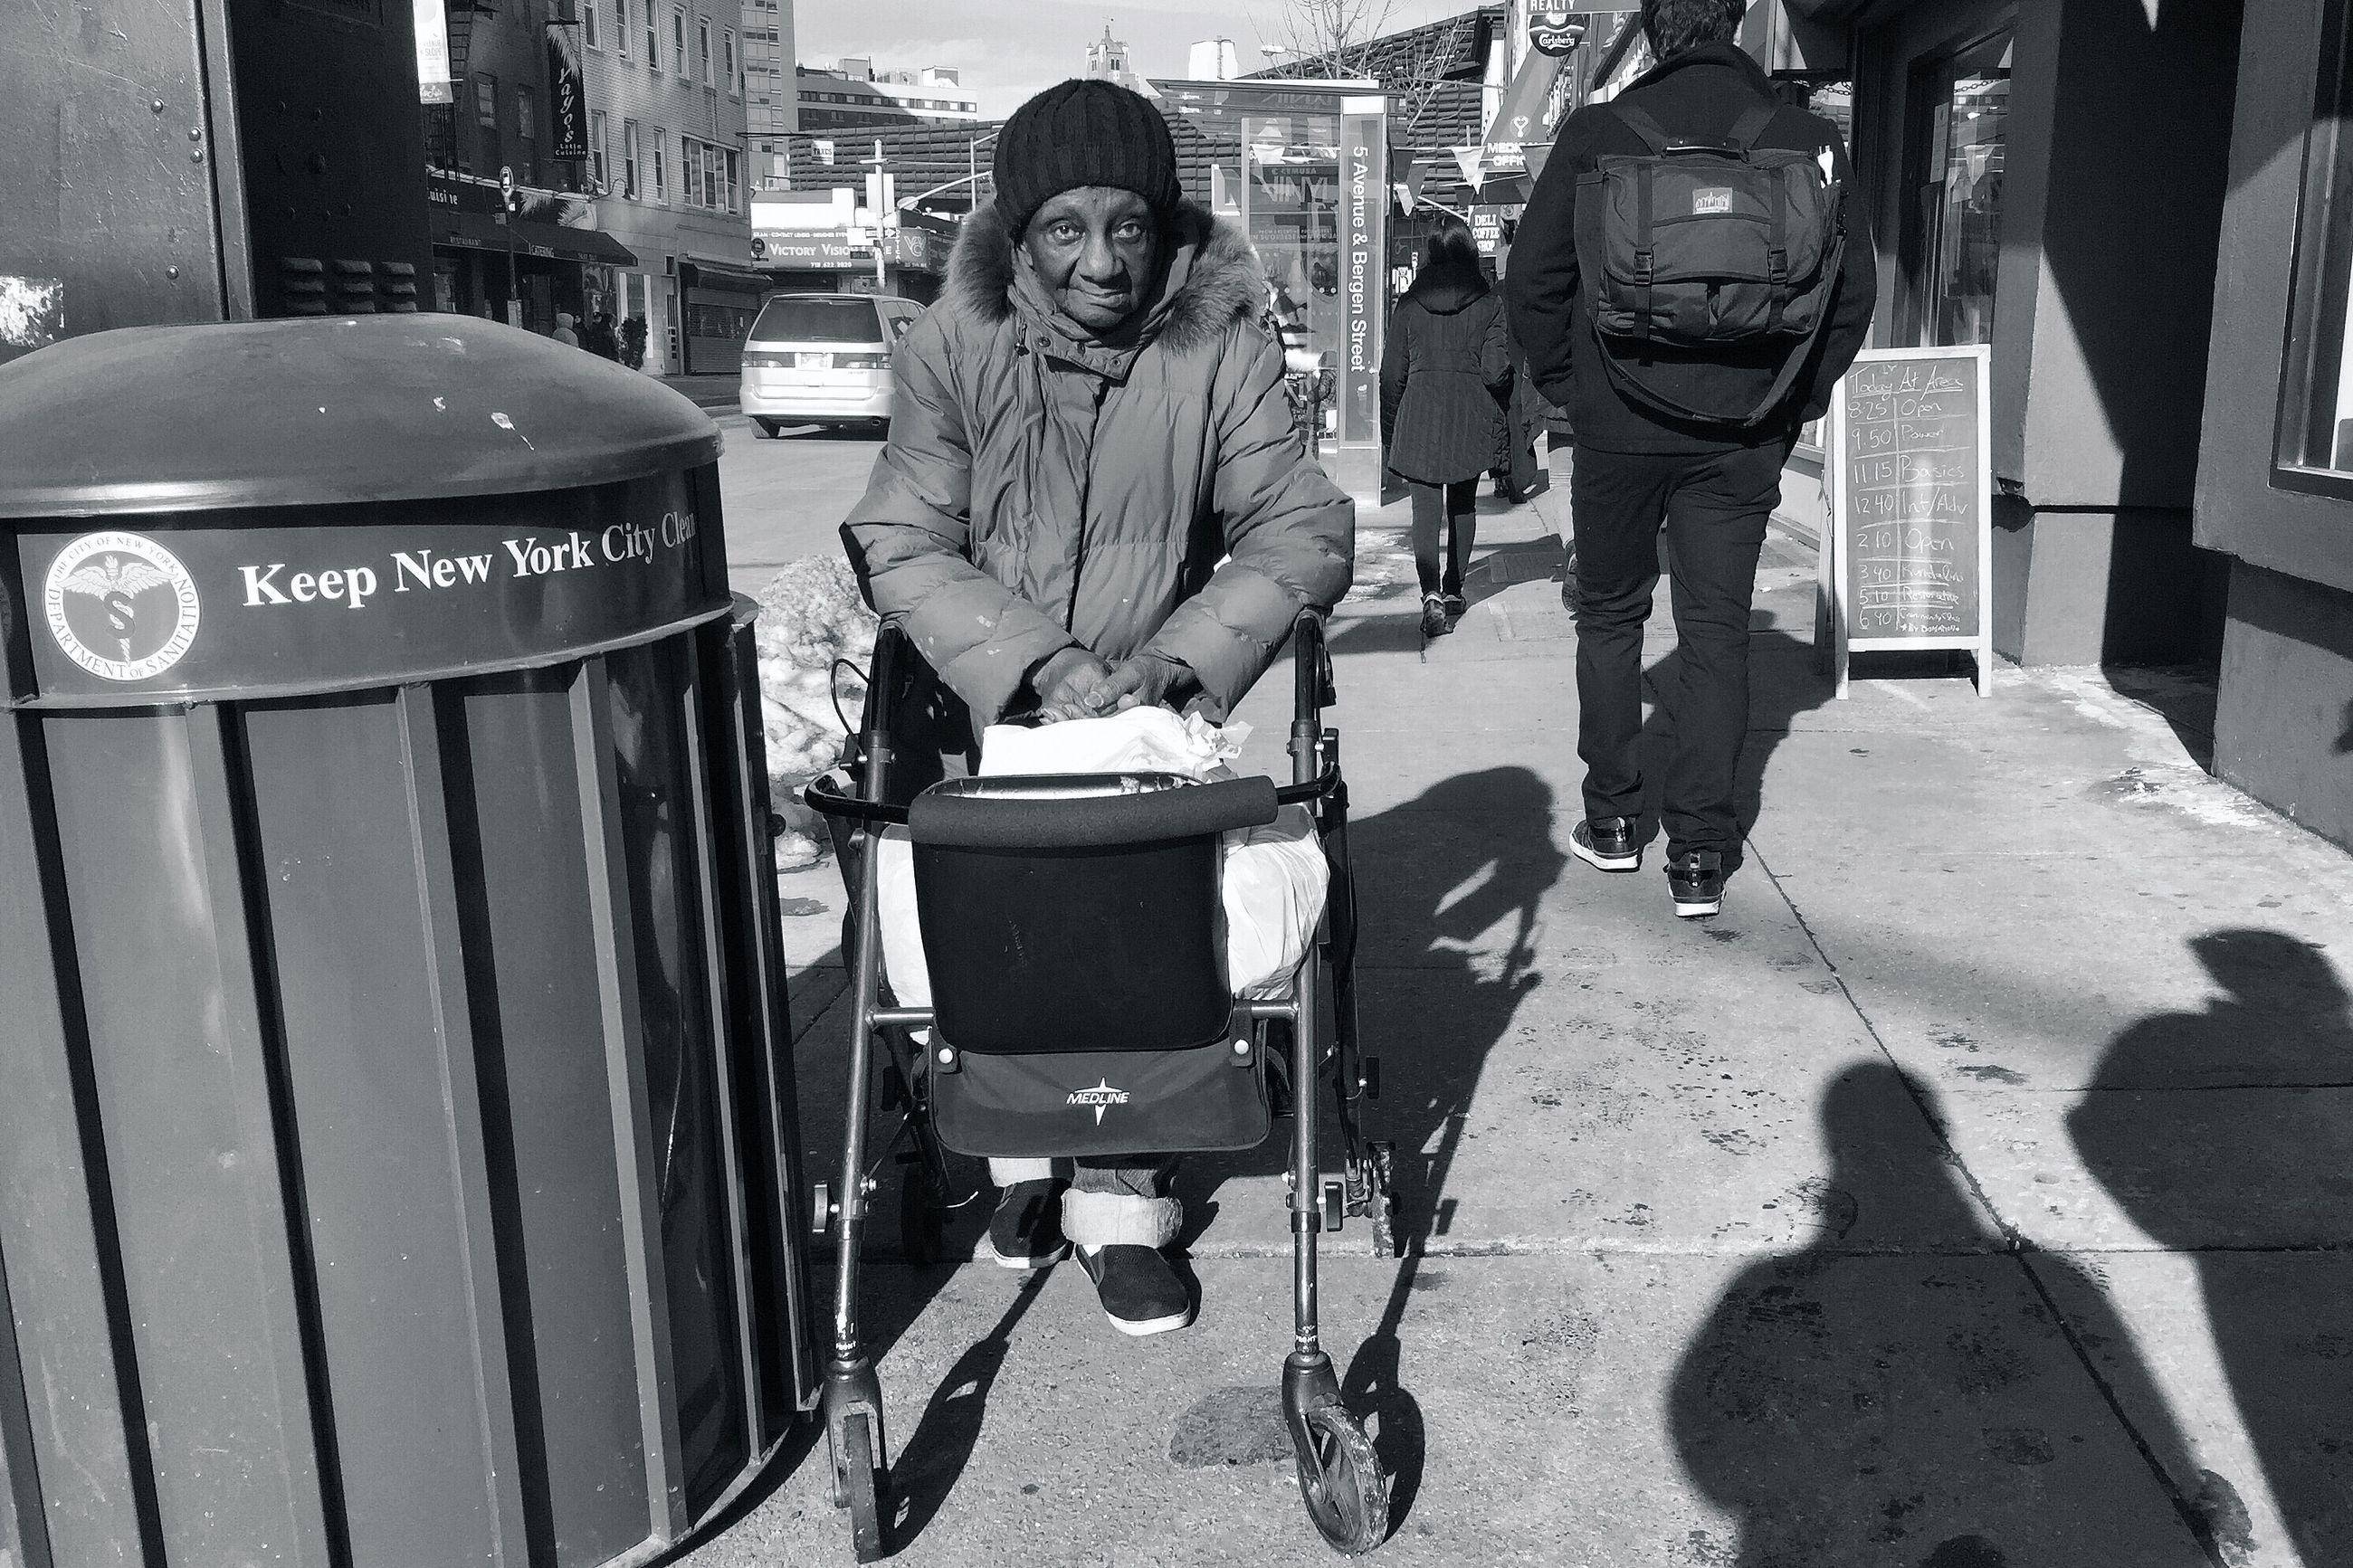 street, men, walking, lifestyles, city, rear view, full length, road, transportation, building exterior, winter, cold temperature, city life, season, leisure activity, car, sidewalk